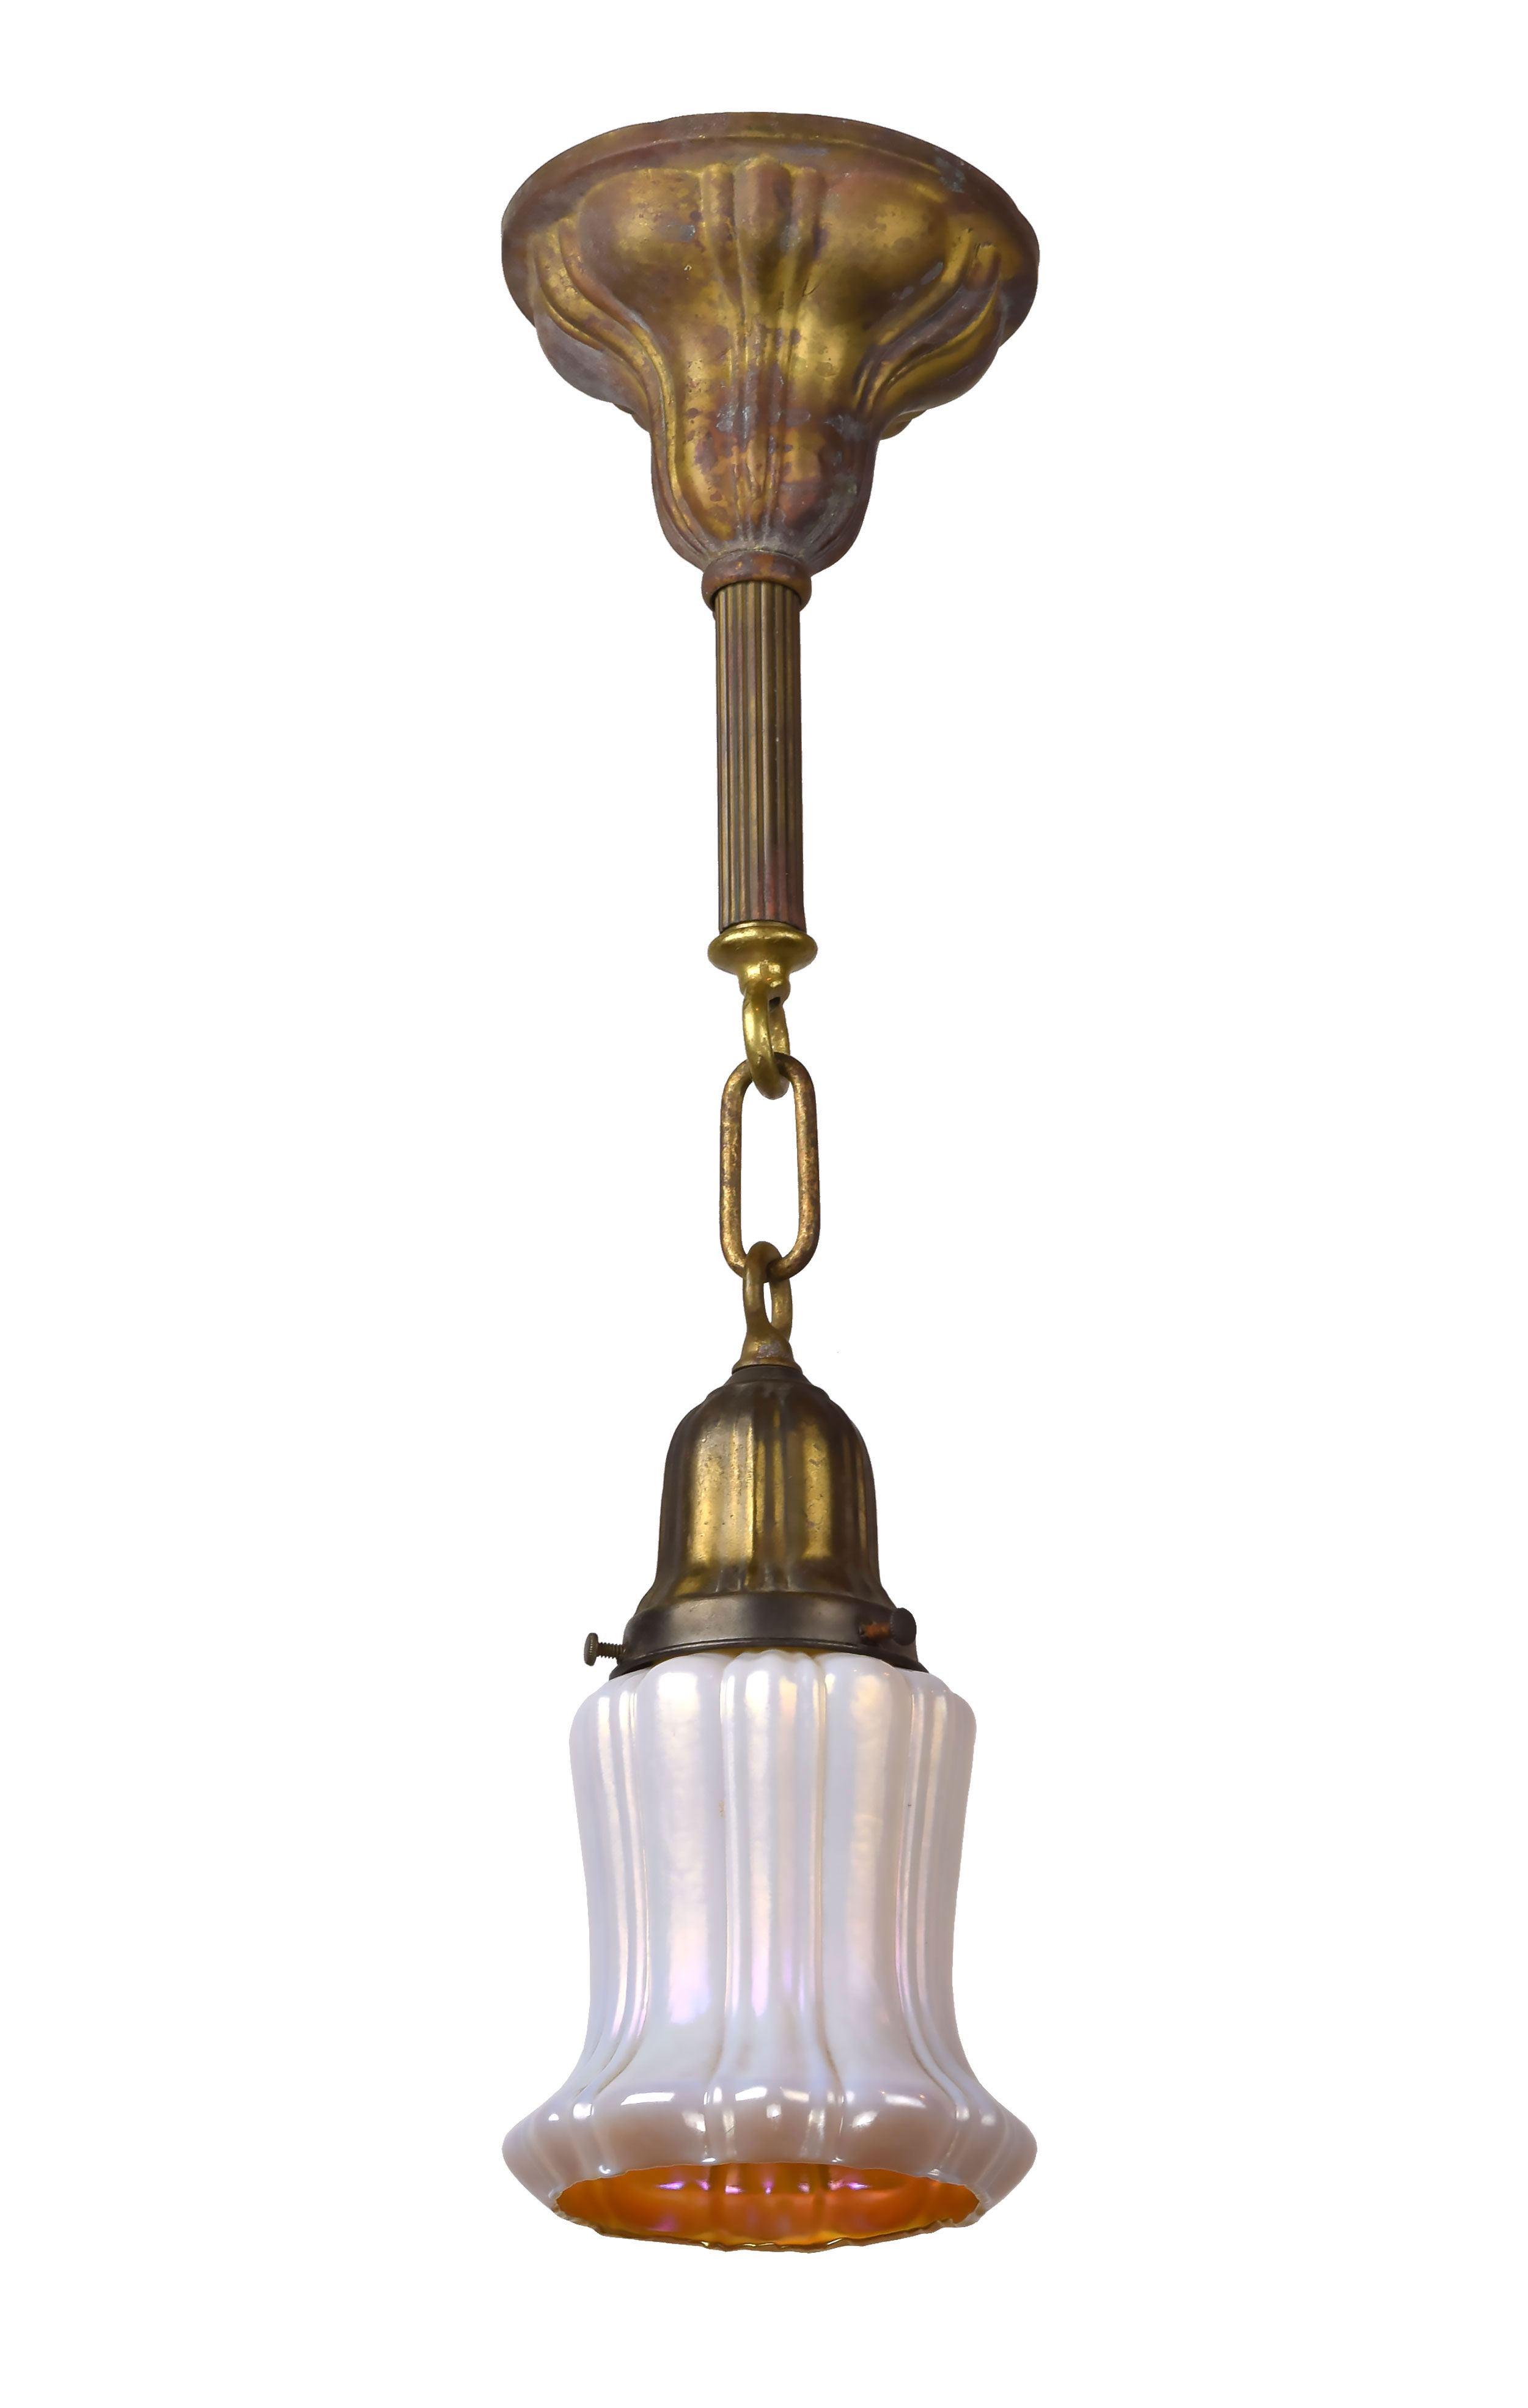 47160-shiny-art-glass-shade-on-sheffield-pendant.jpg